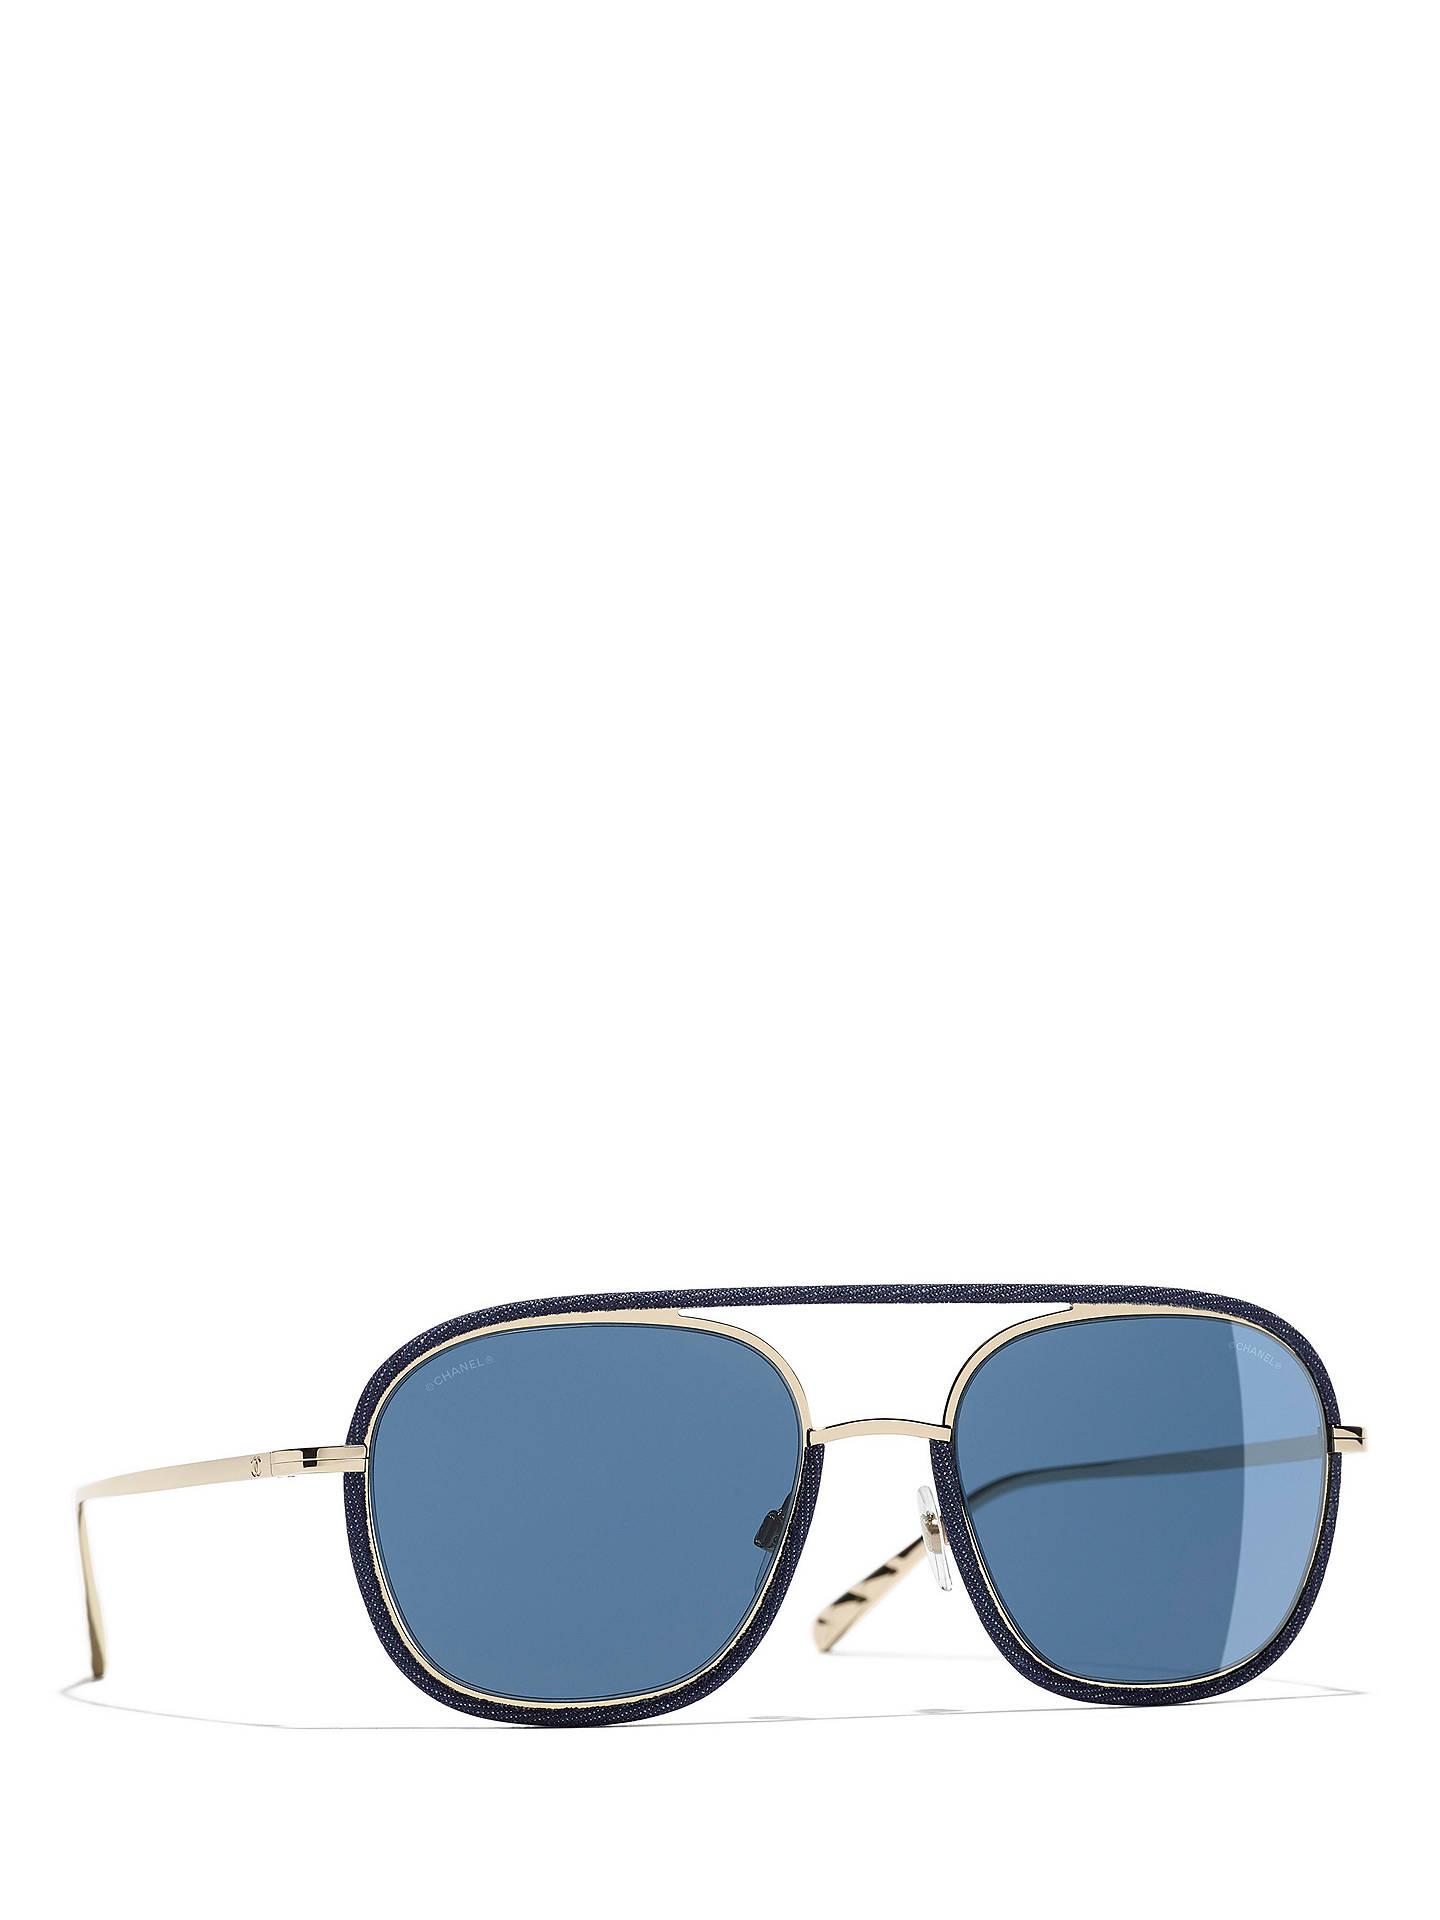 d4564342eada Buy CHANEL Oval Sunglasses CH4249J Gold Blue Online at johnlewis.com ...